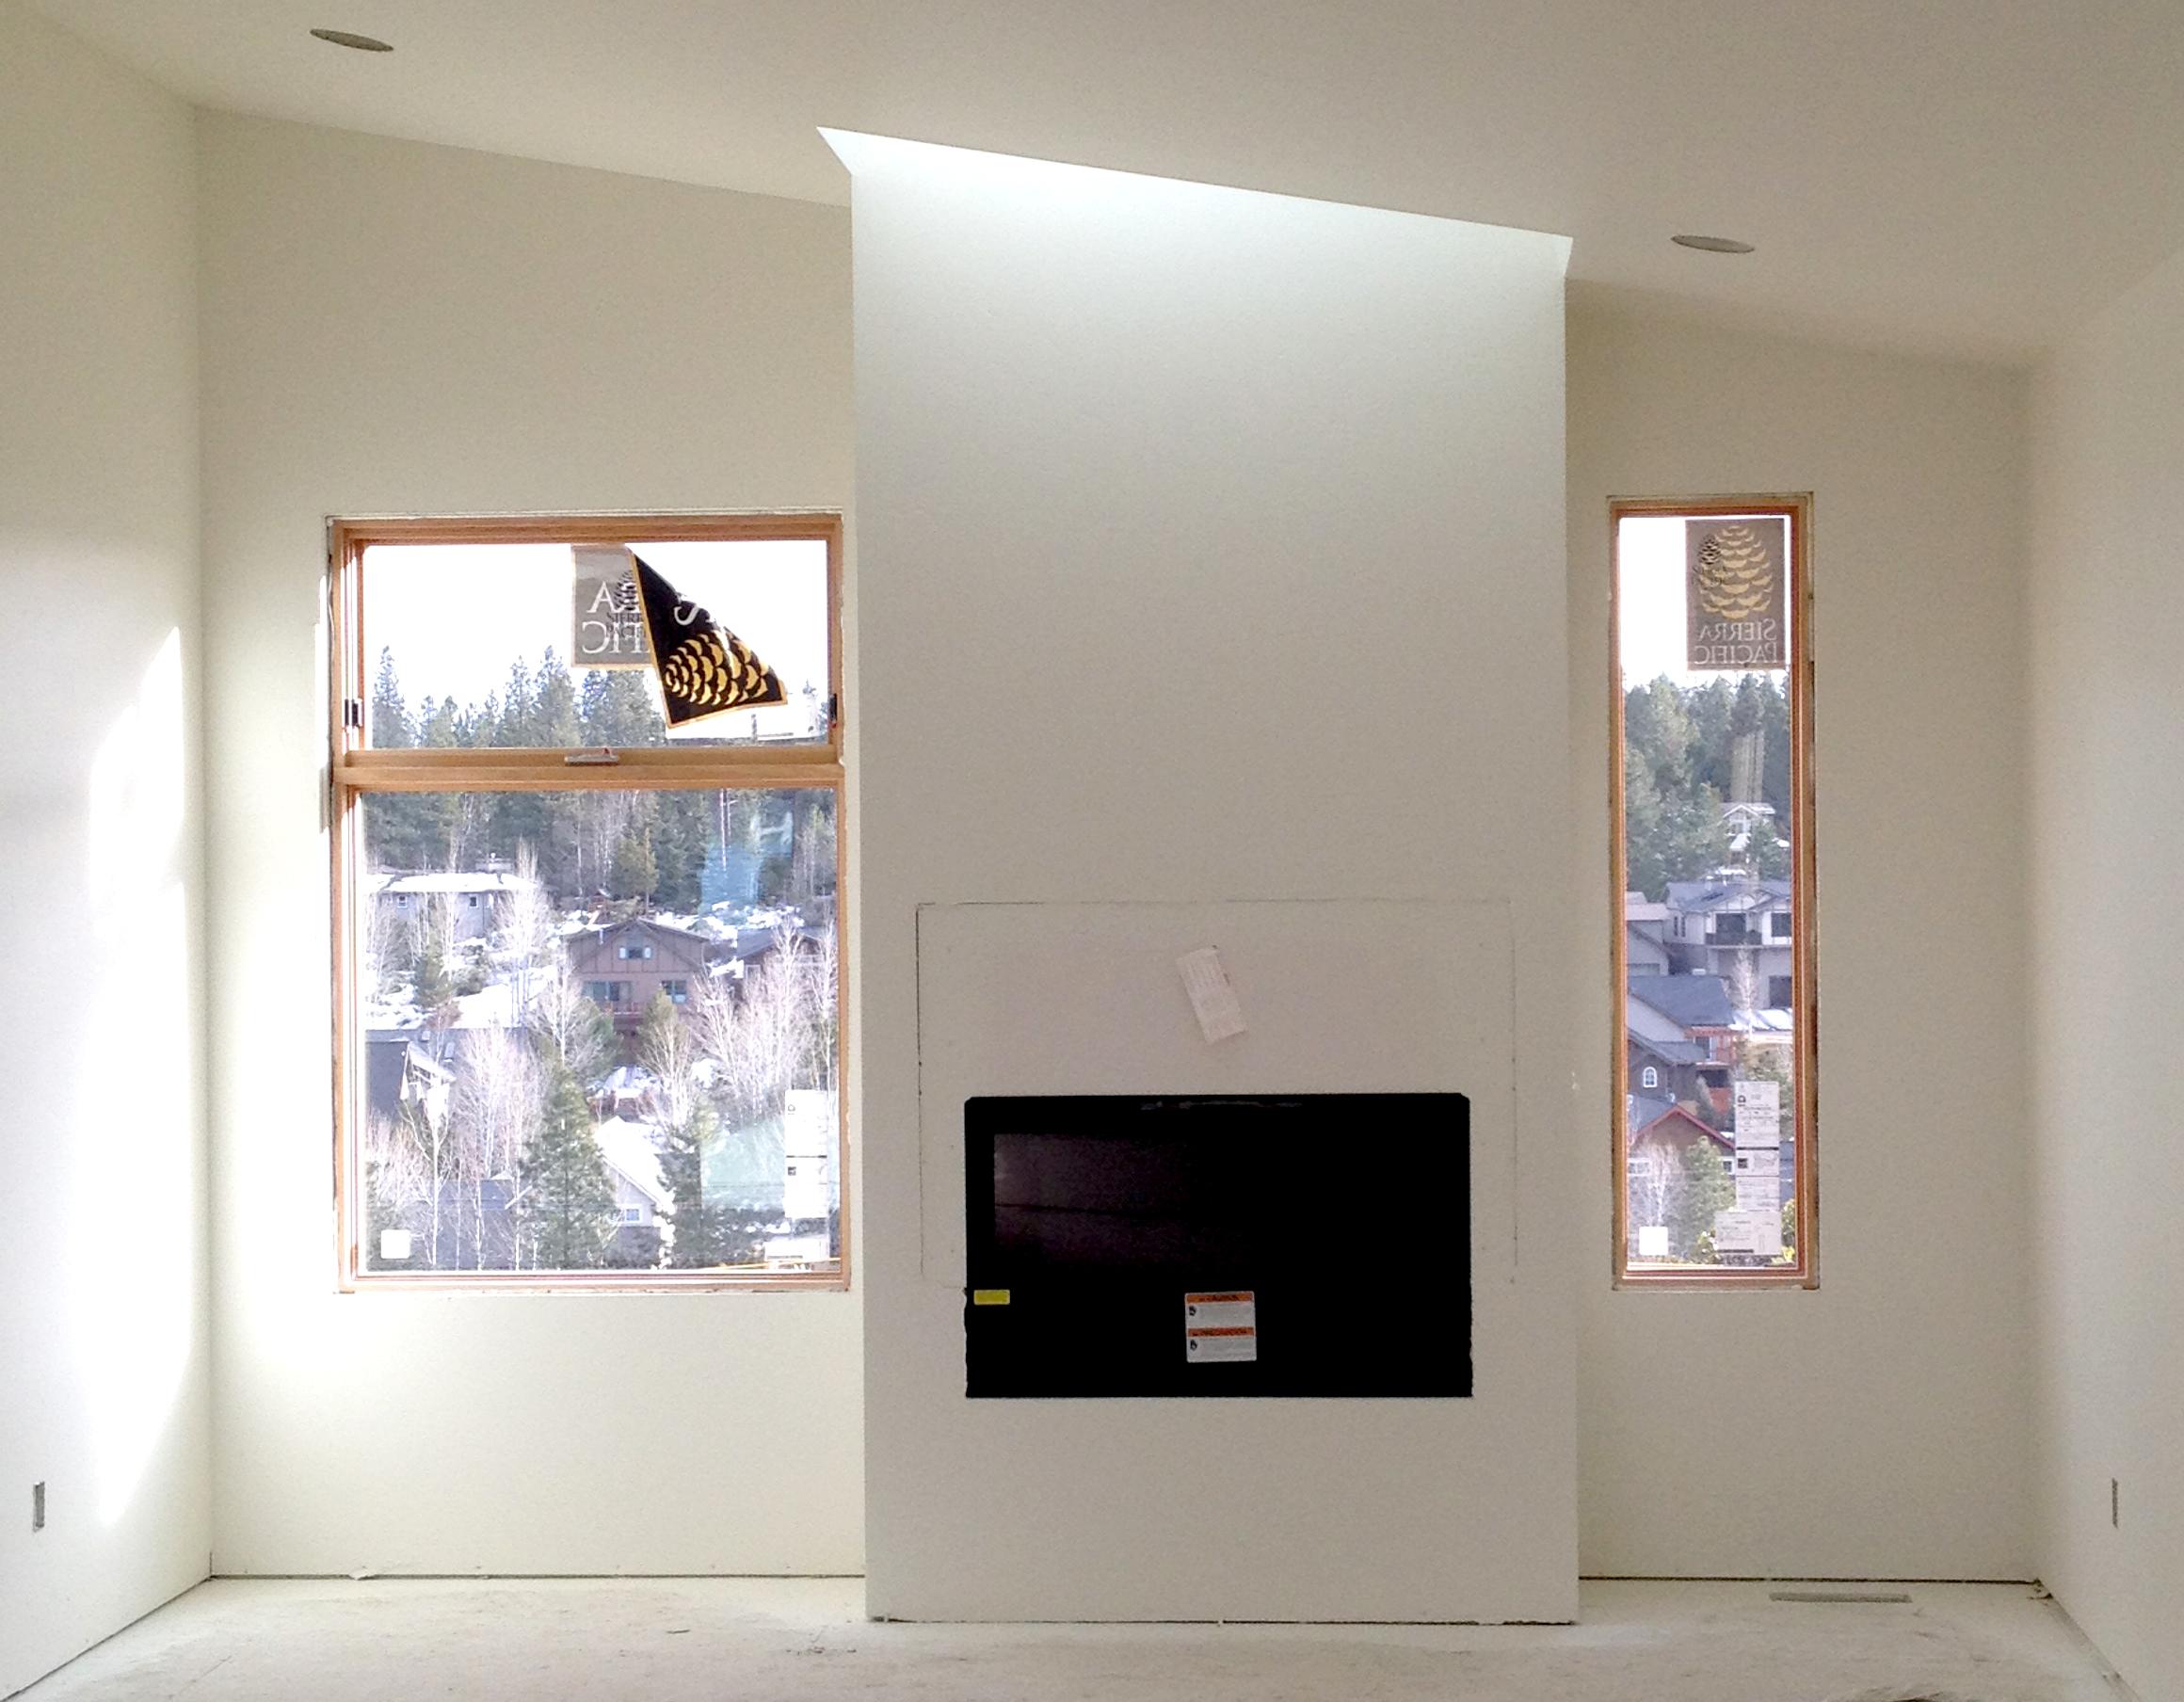 Fireplace bump-out w/ skylight above